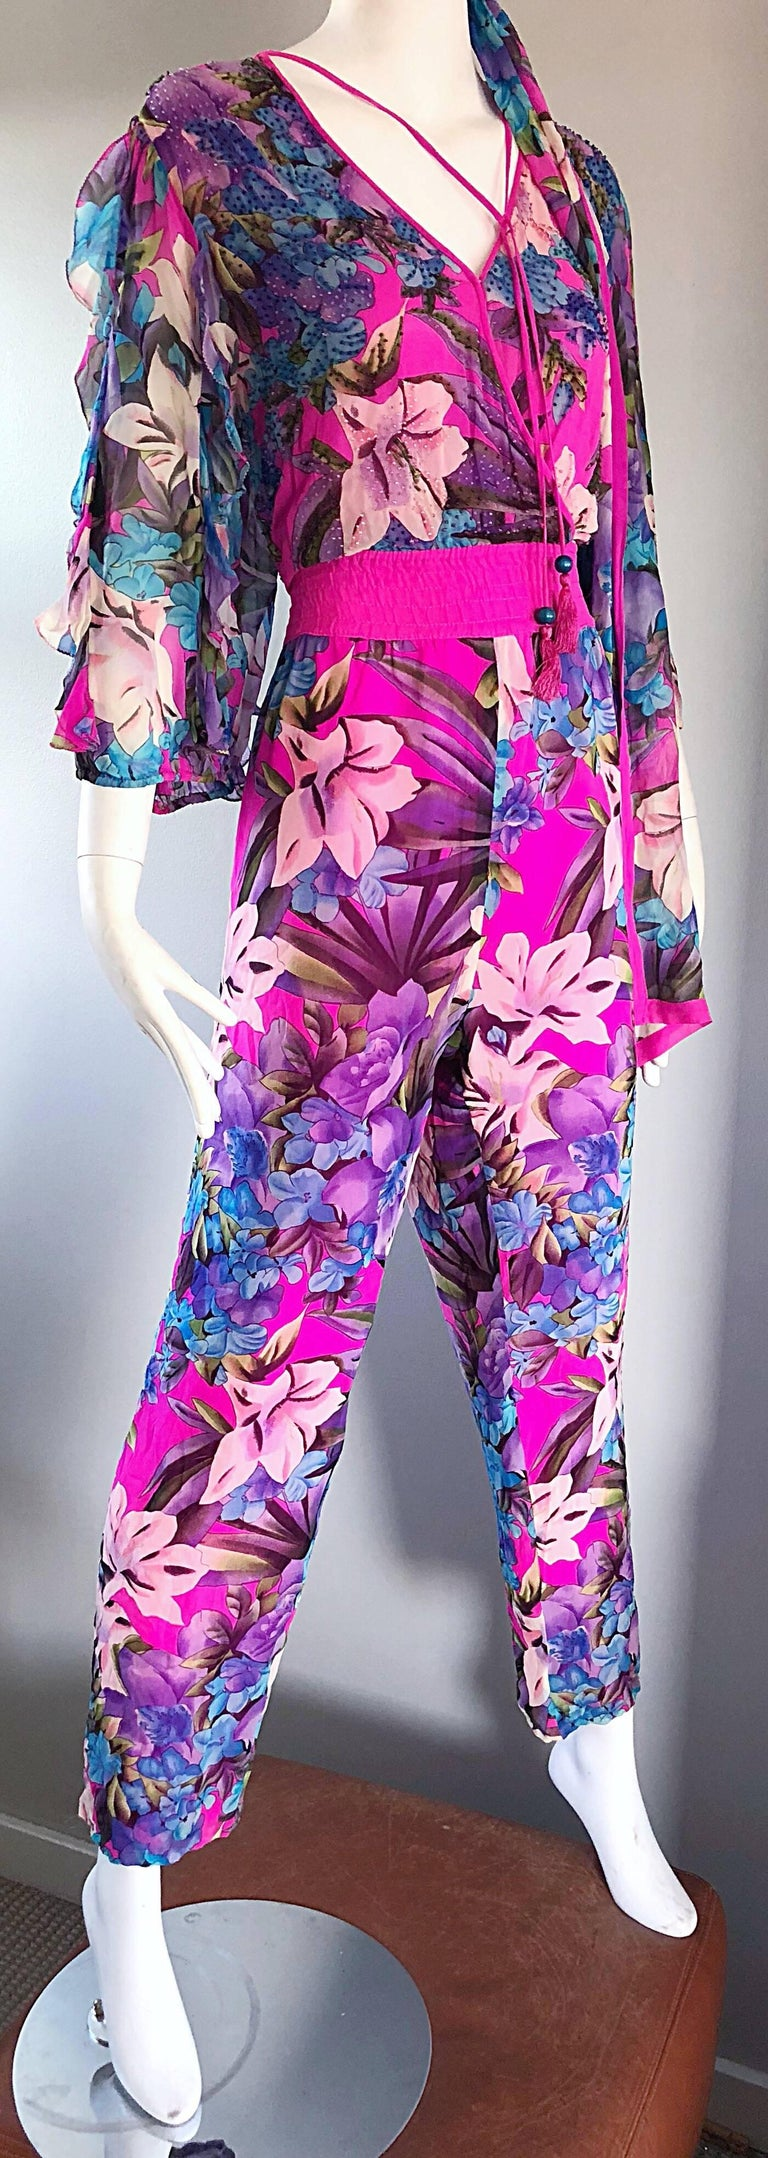 Amazing Vintage Diane Freis Silk Chiffon Beaded Pink Jumpsuit & Head Scarf Sash  For Sale 3